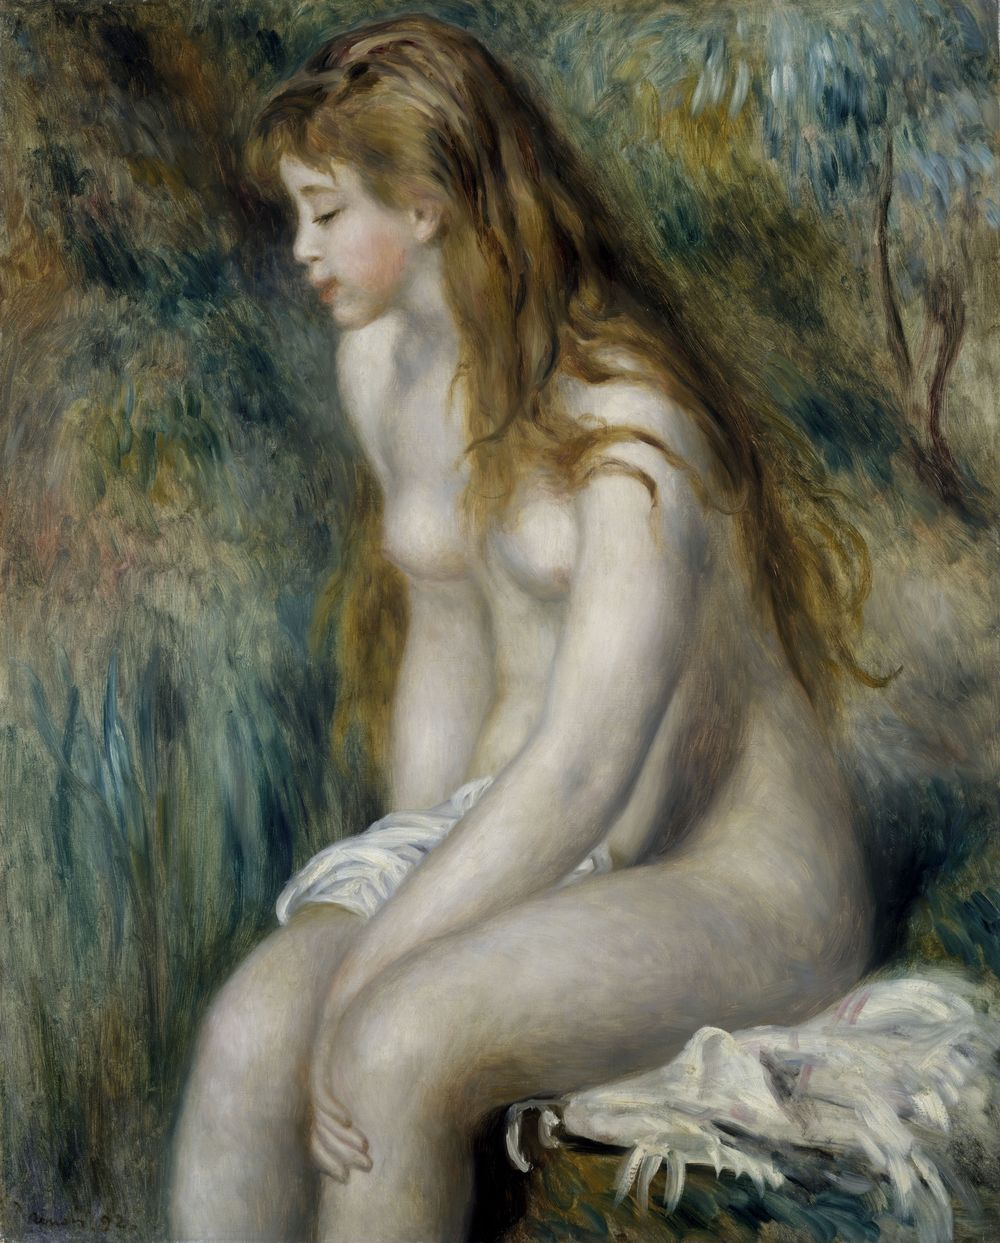 Pierre-Auguste Renoir – Baigneuse assise 1892 – Huile sur toile – 81,3 x 64,8 cm New York, The Metropolitan Museum of Art © The Metropolitan Museum of Art, Dist. RMN-Grand Palais / image of the MMA